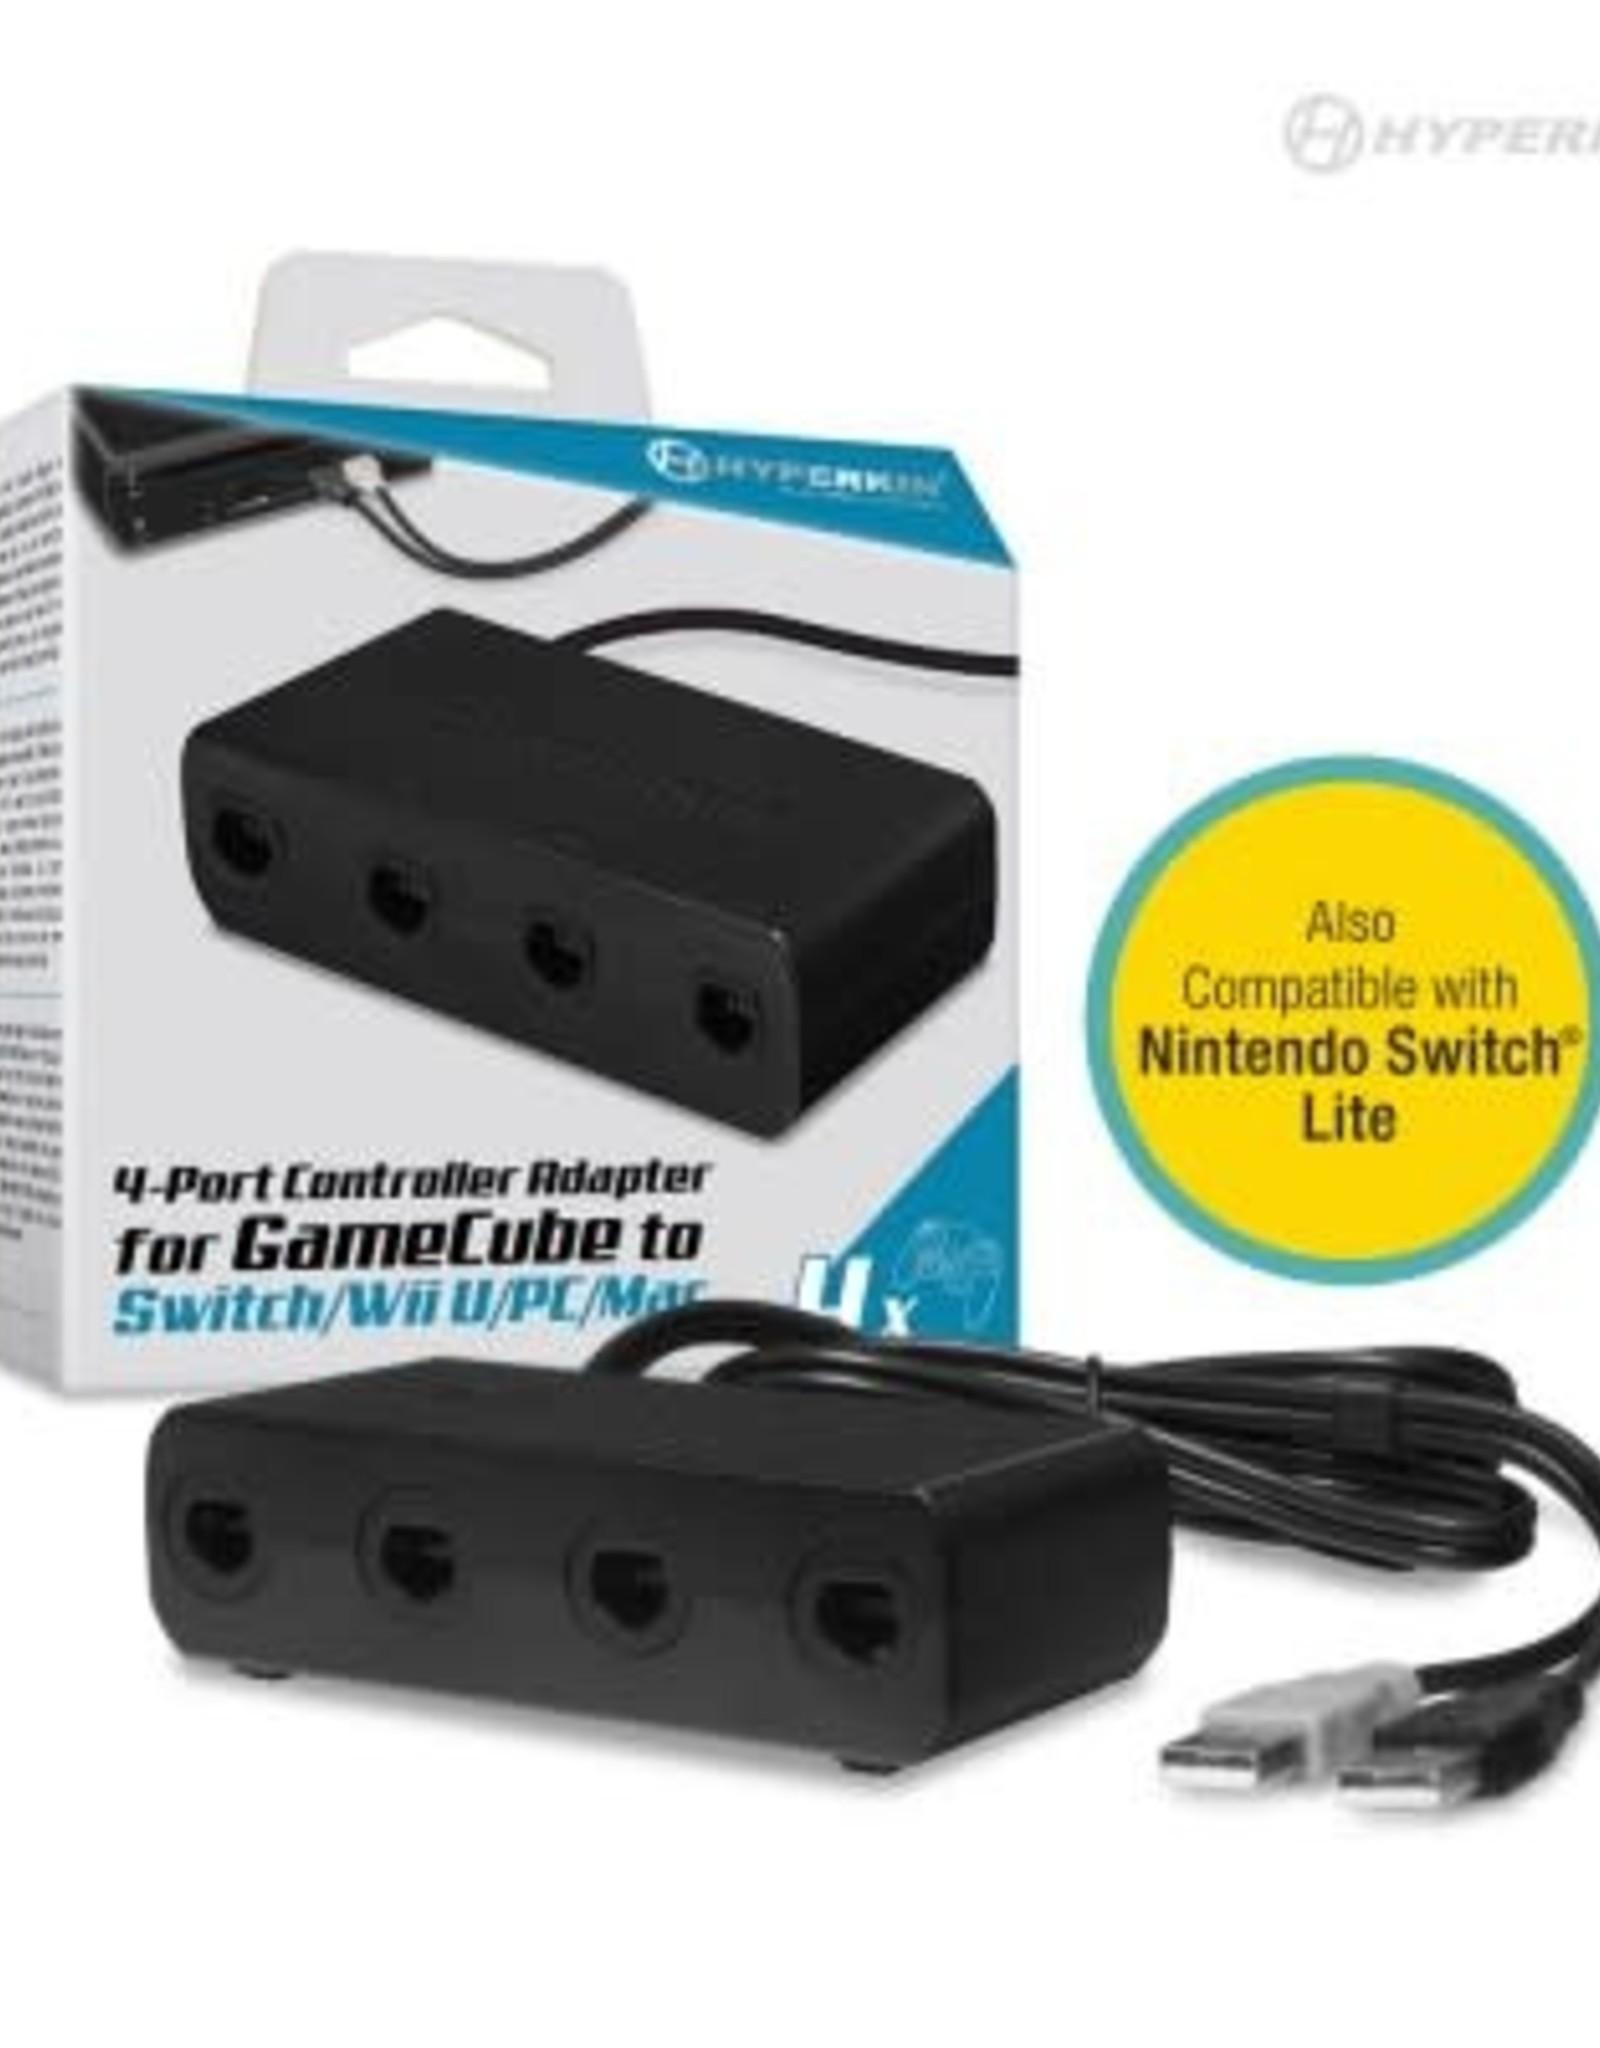 Hyperkin 4-port Controller Adapter for GameCube